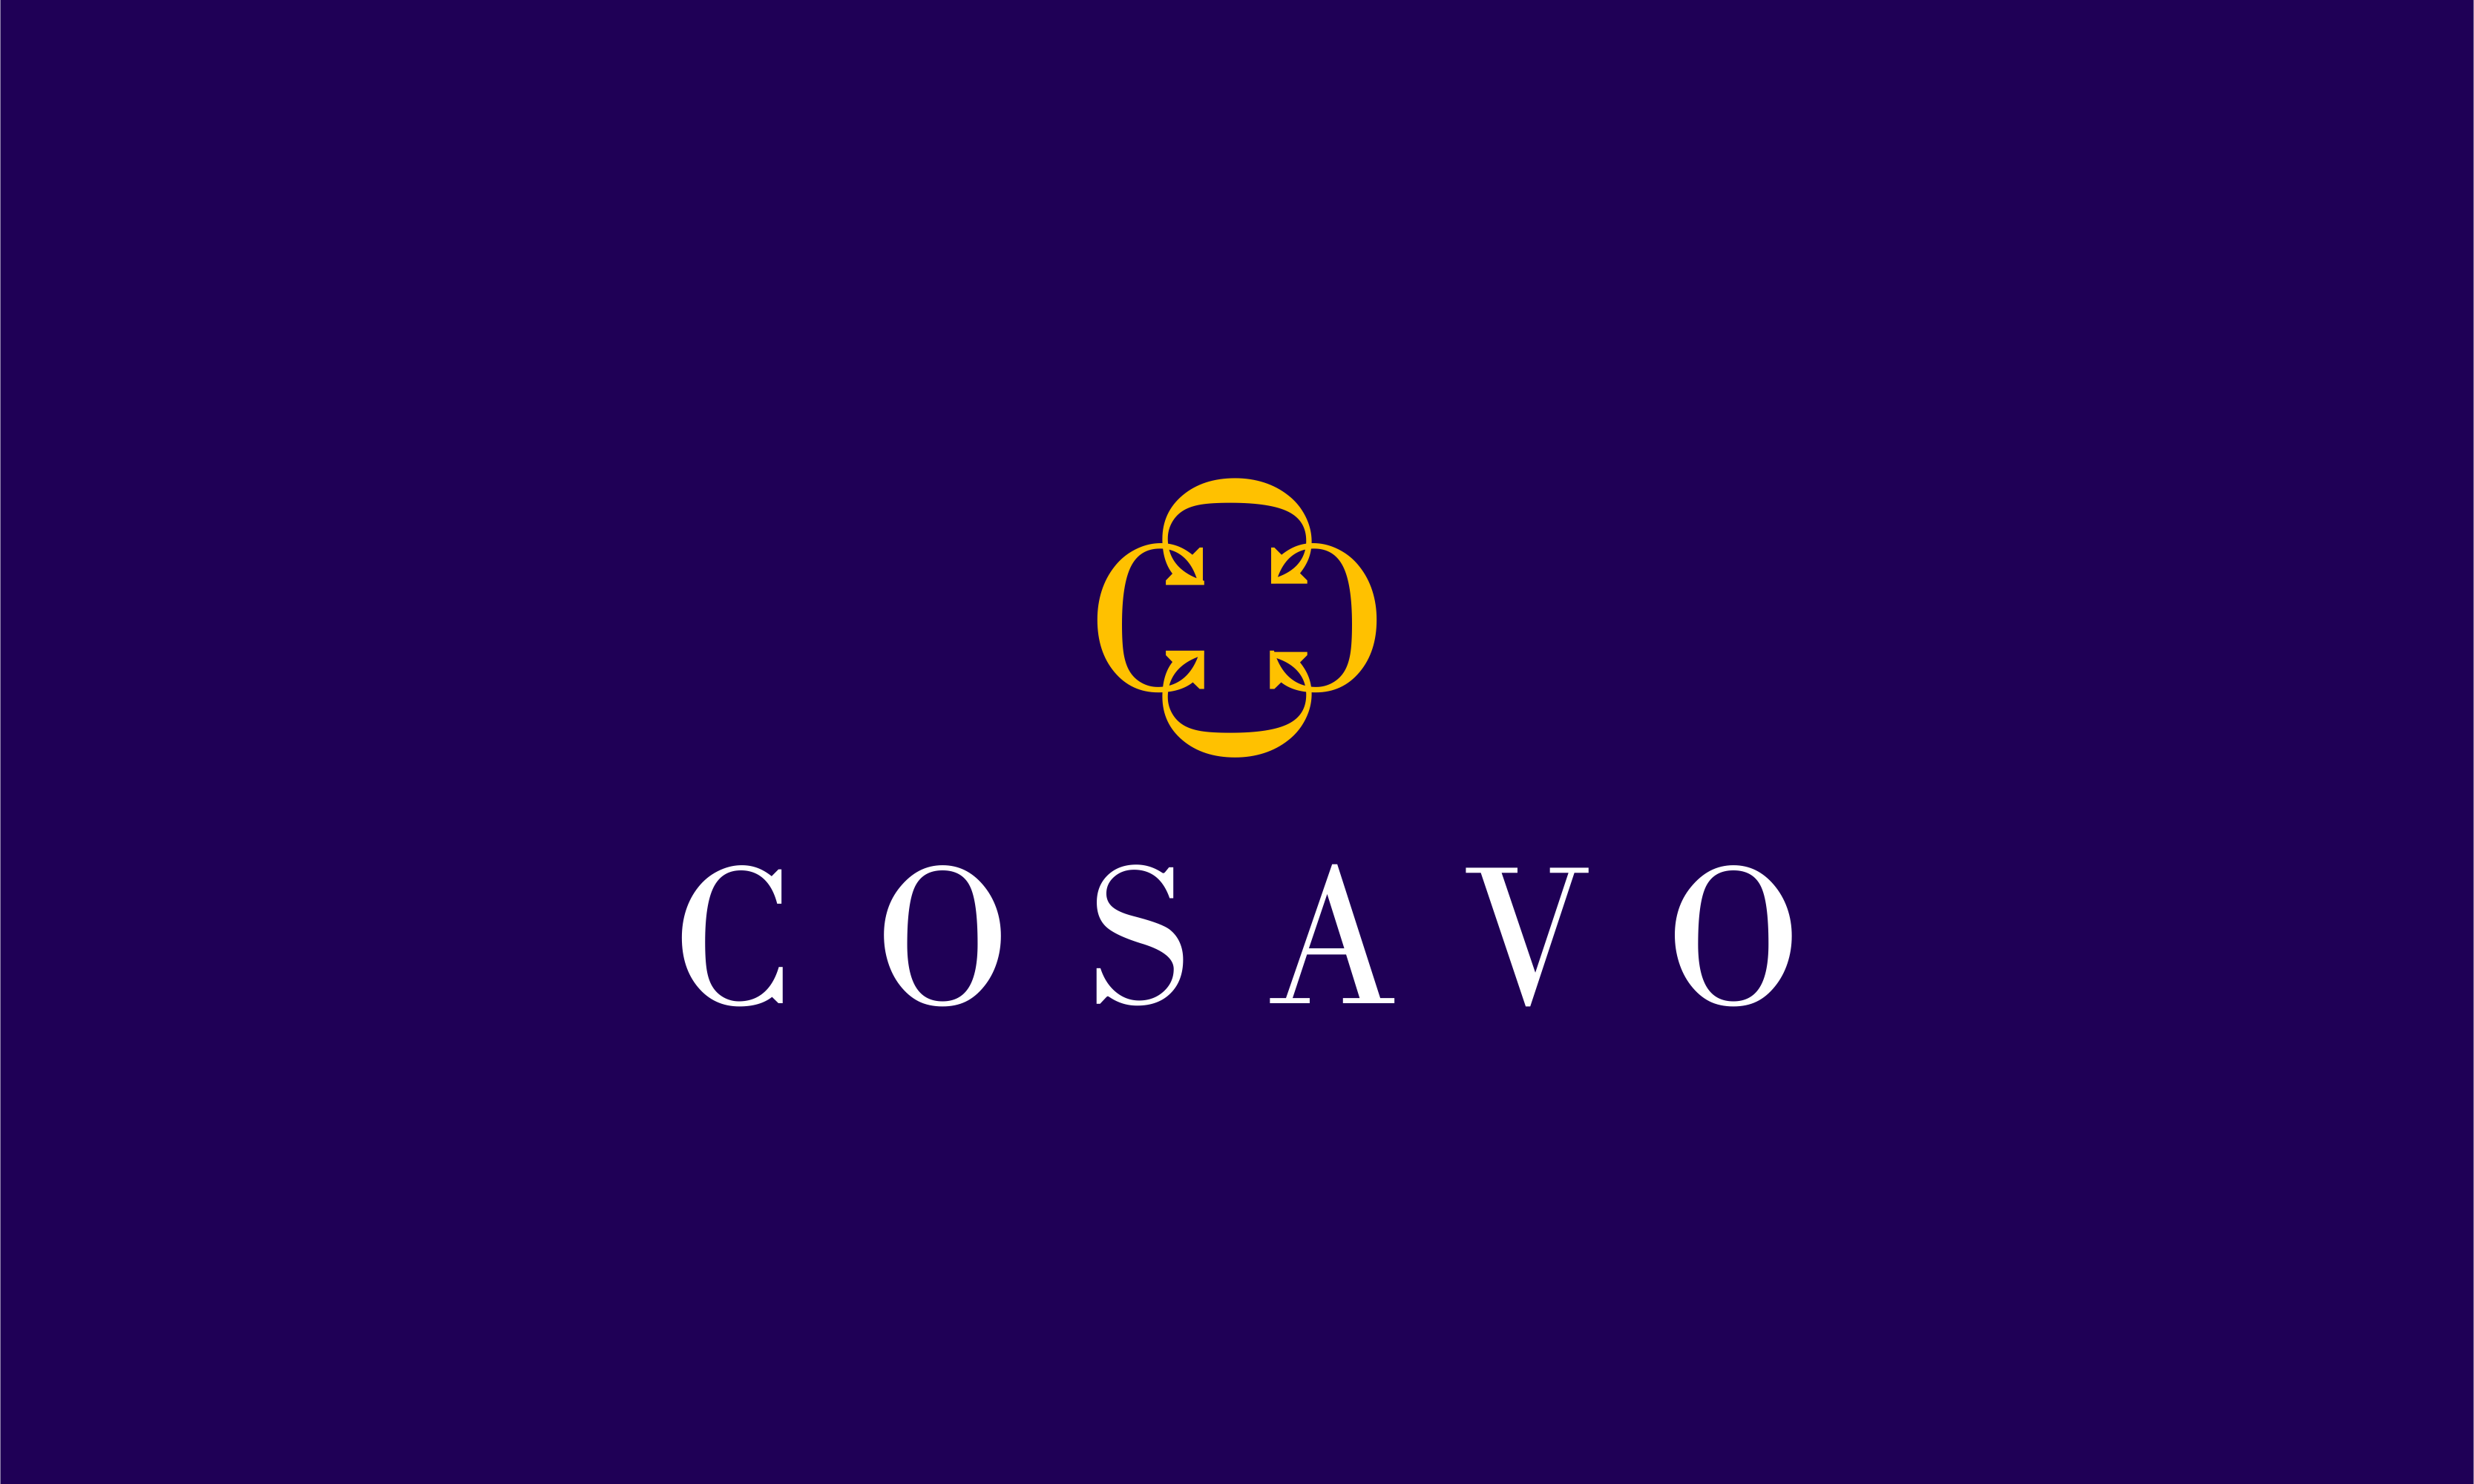 Cosavo